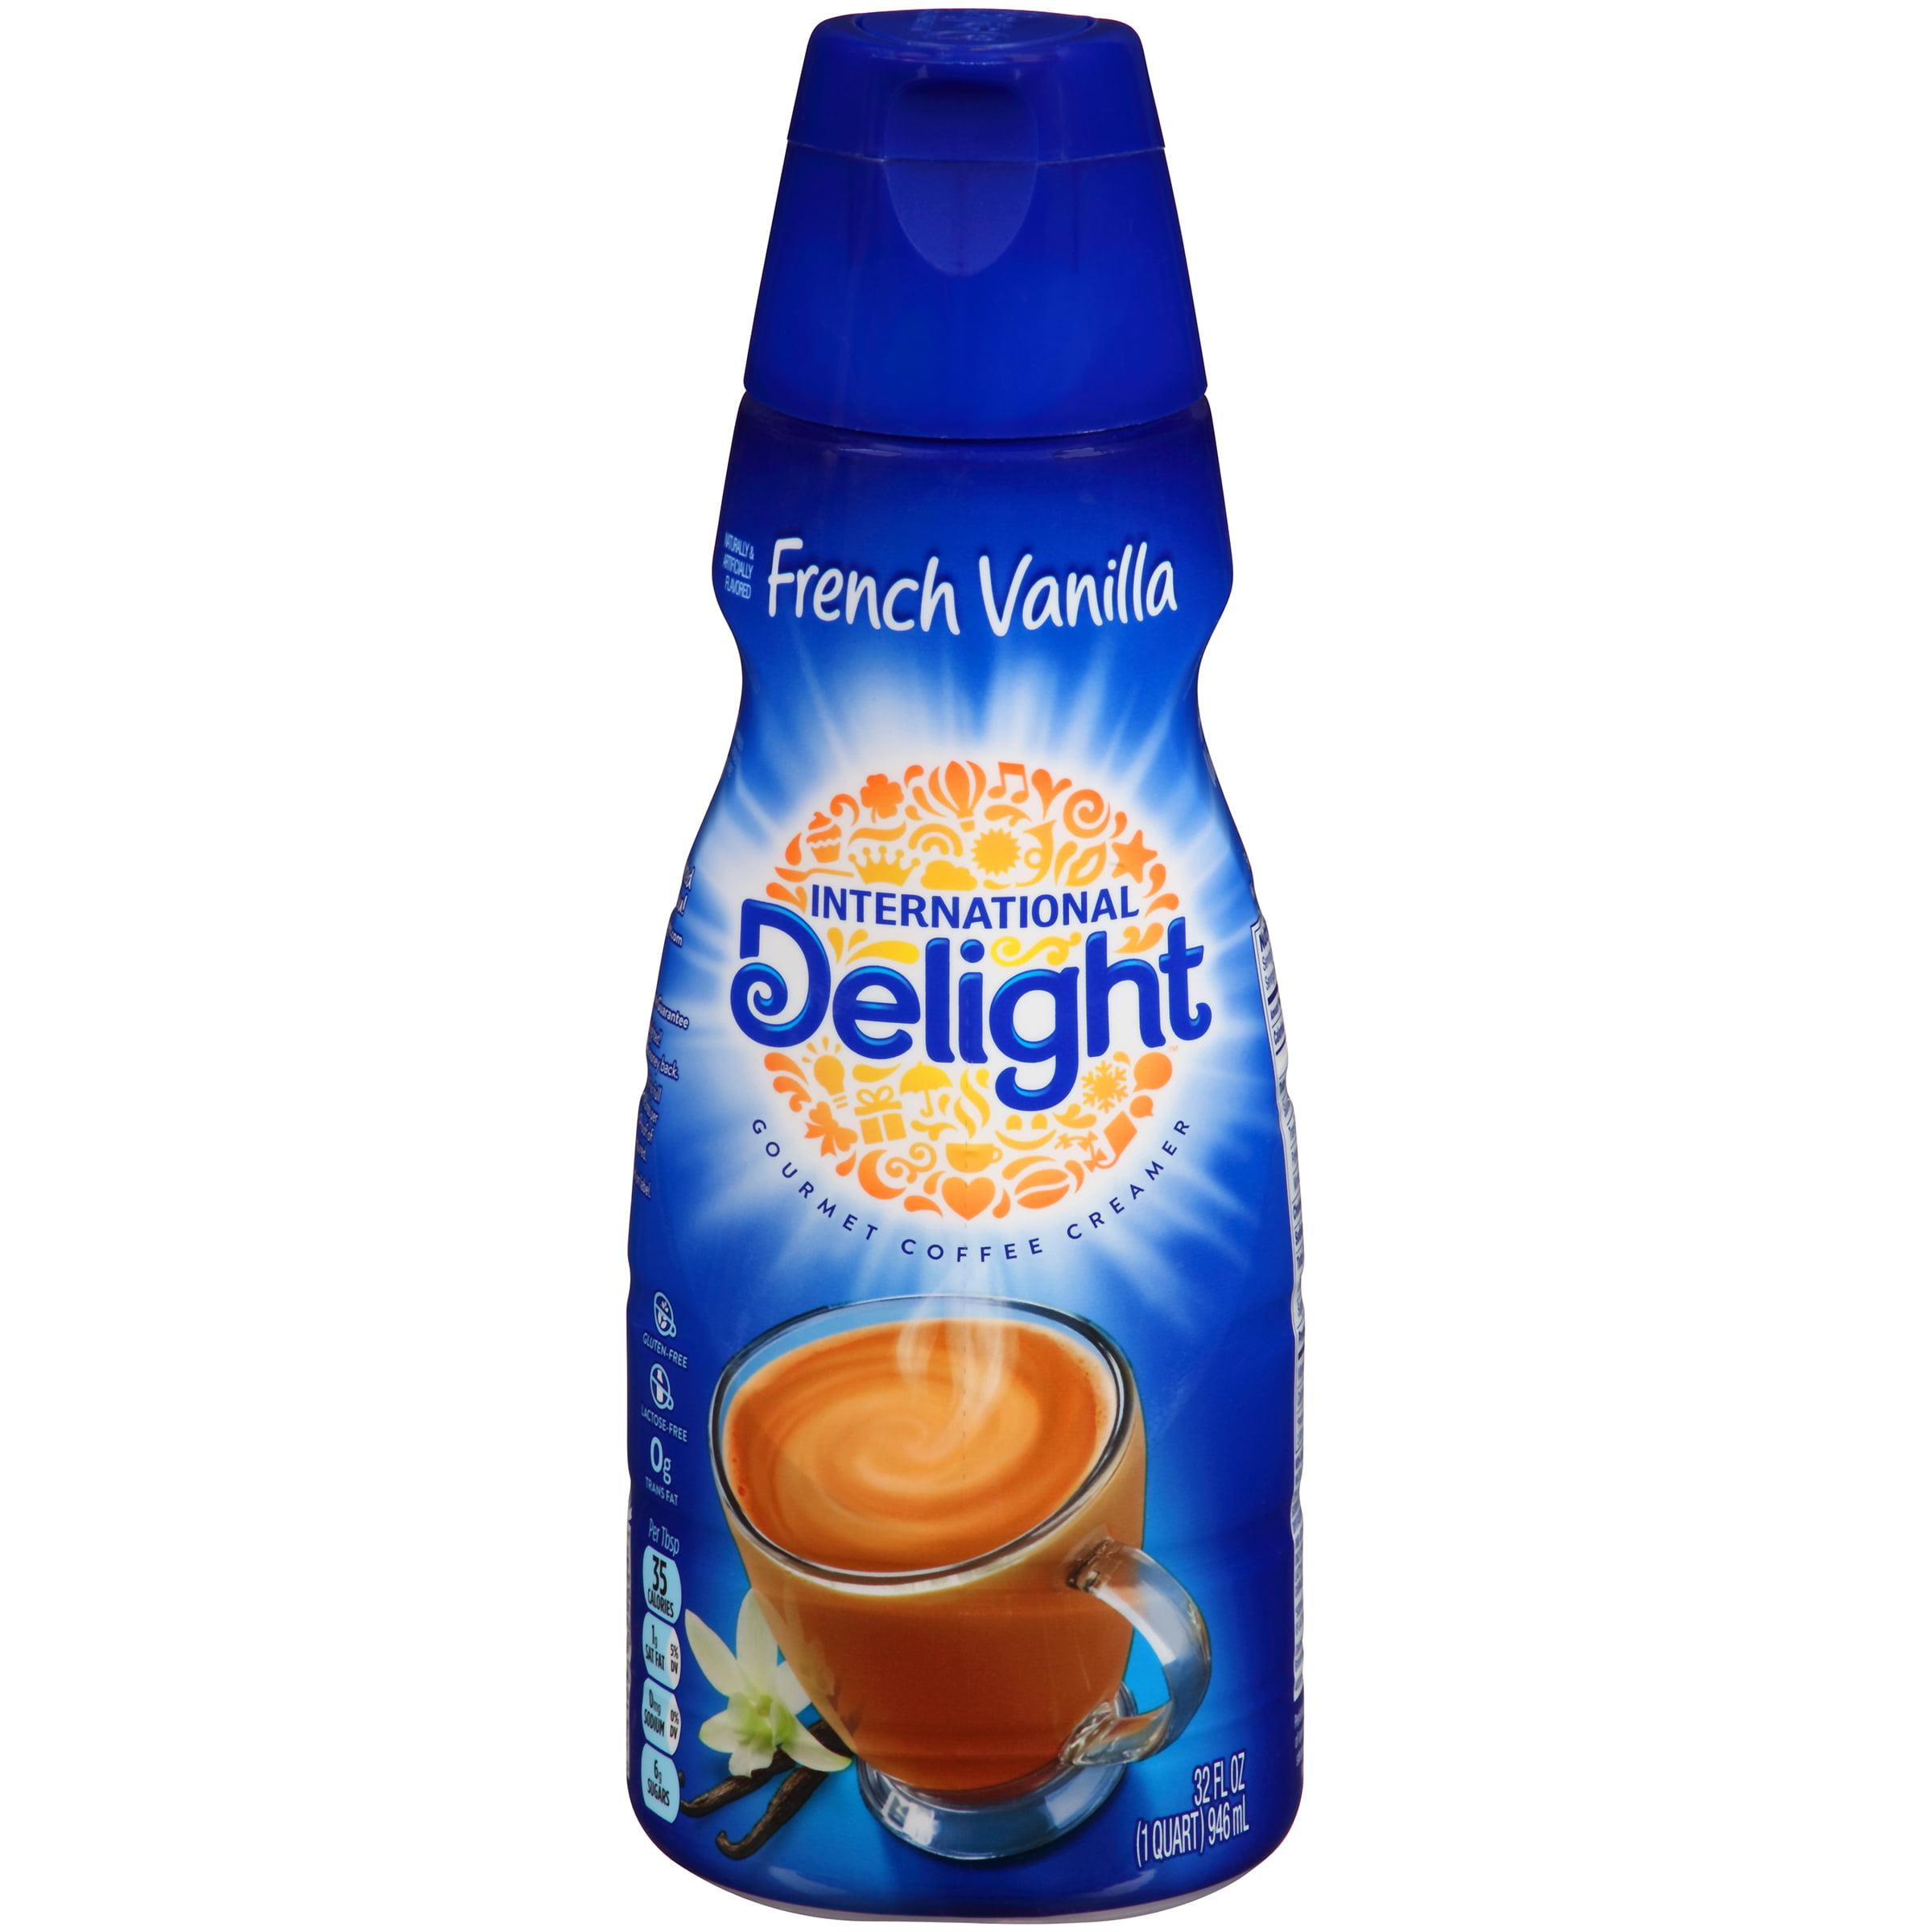 International Delight��� French Vanilla Gourmet Coffee Creamer 32 fl. oz. Plastic Bottle